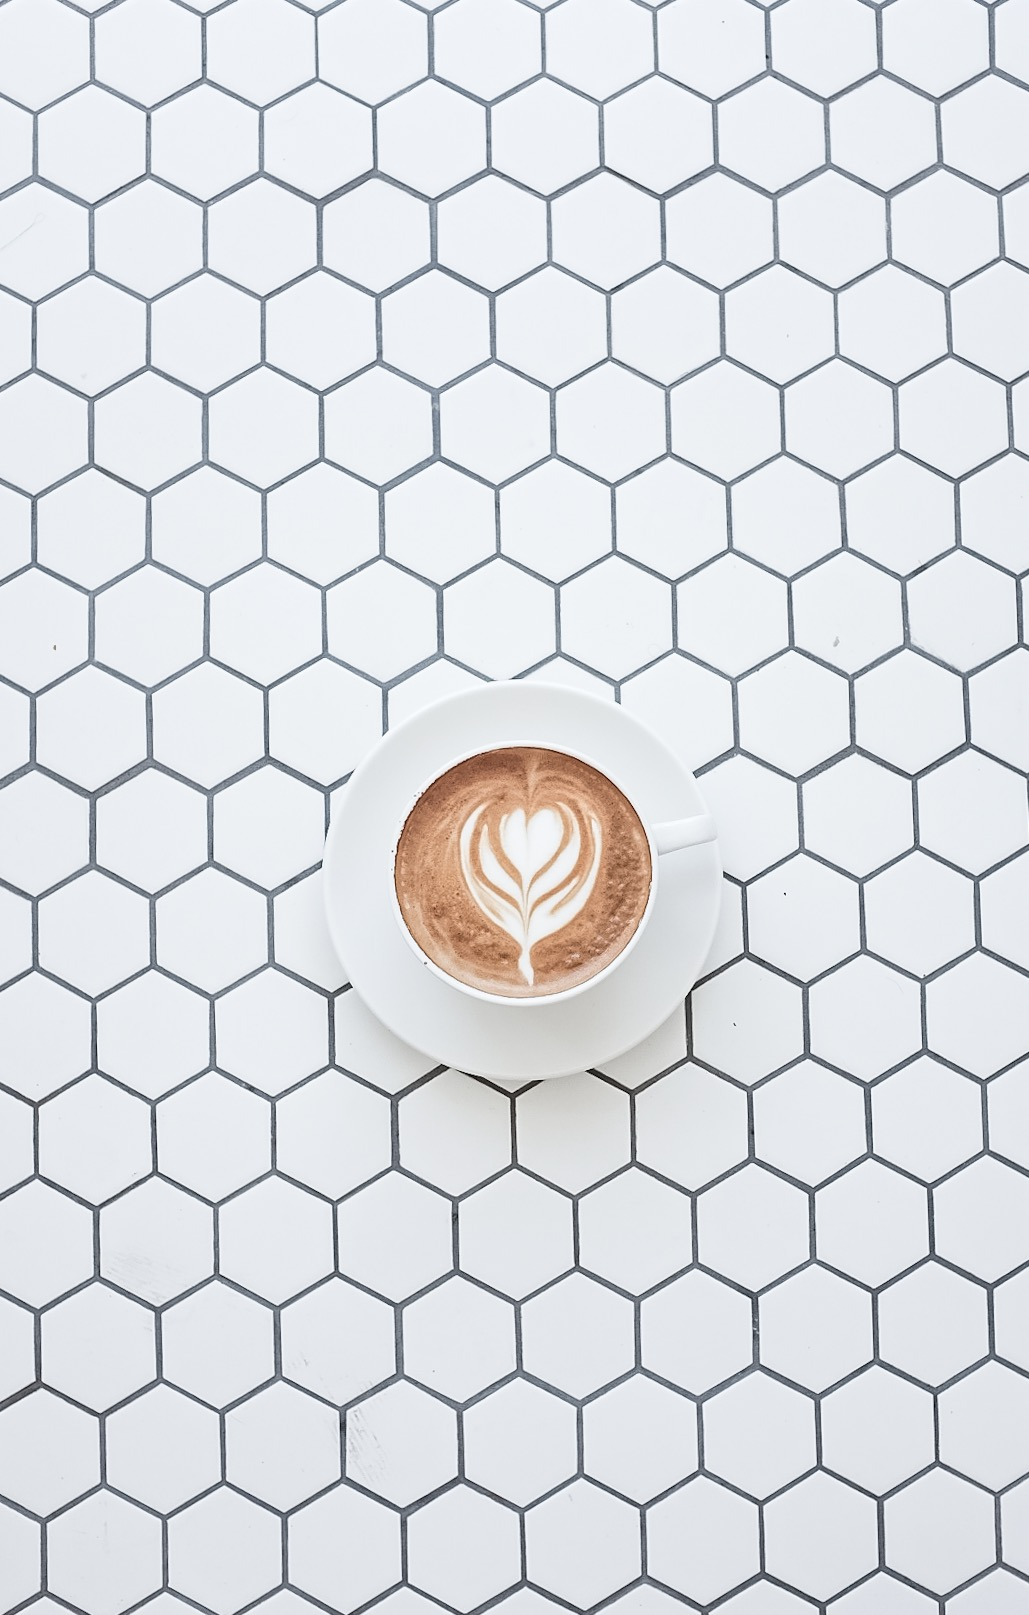 Nice latte art on pretty tiles.